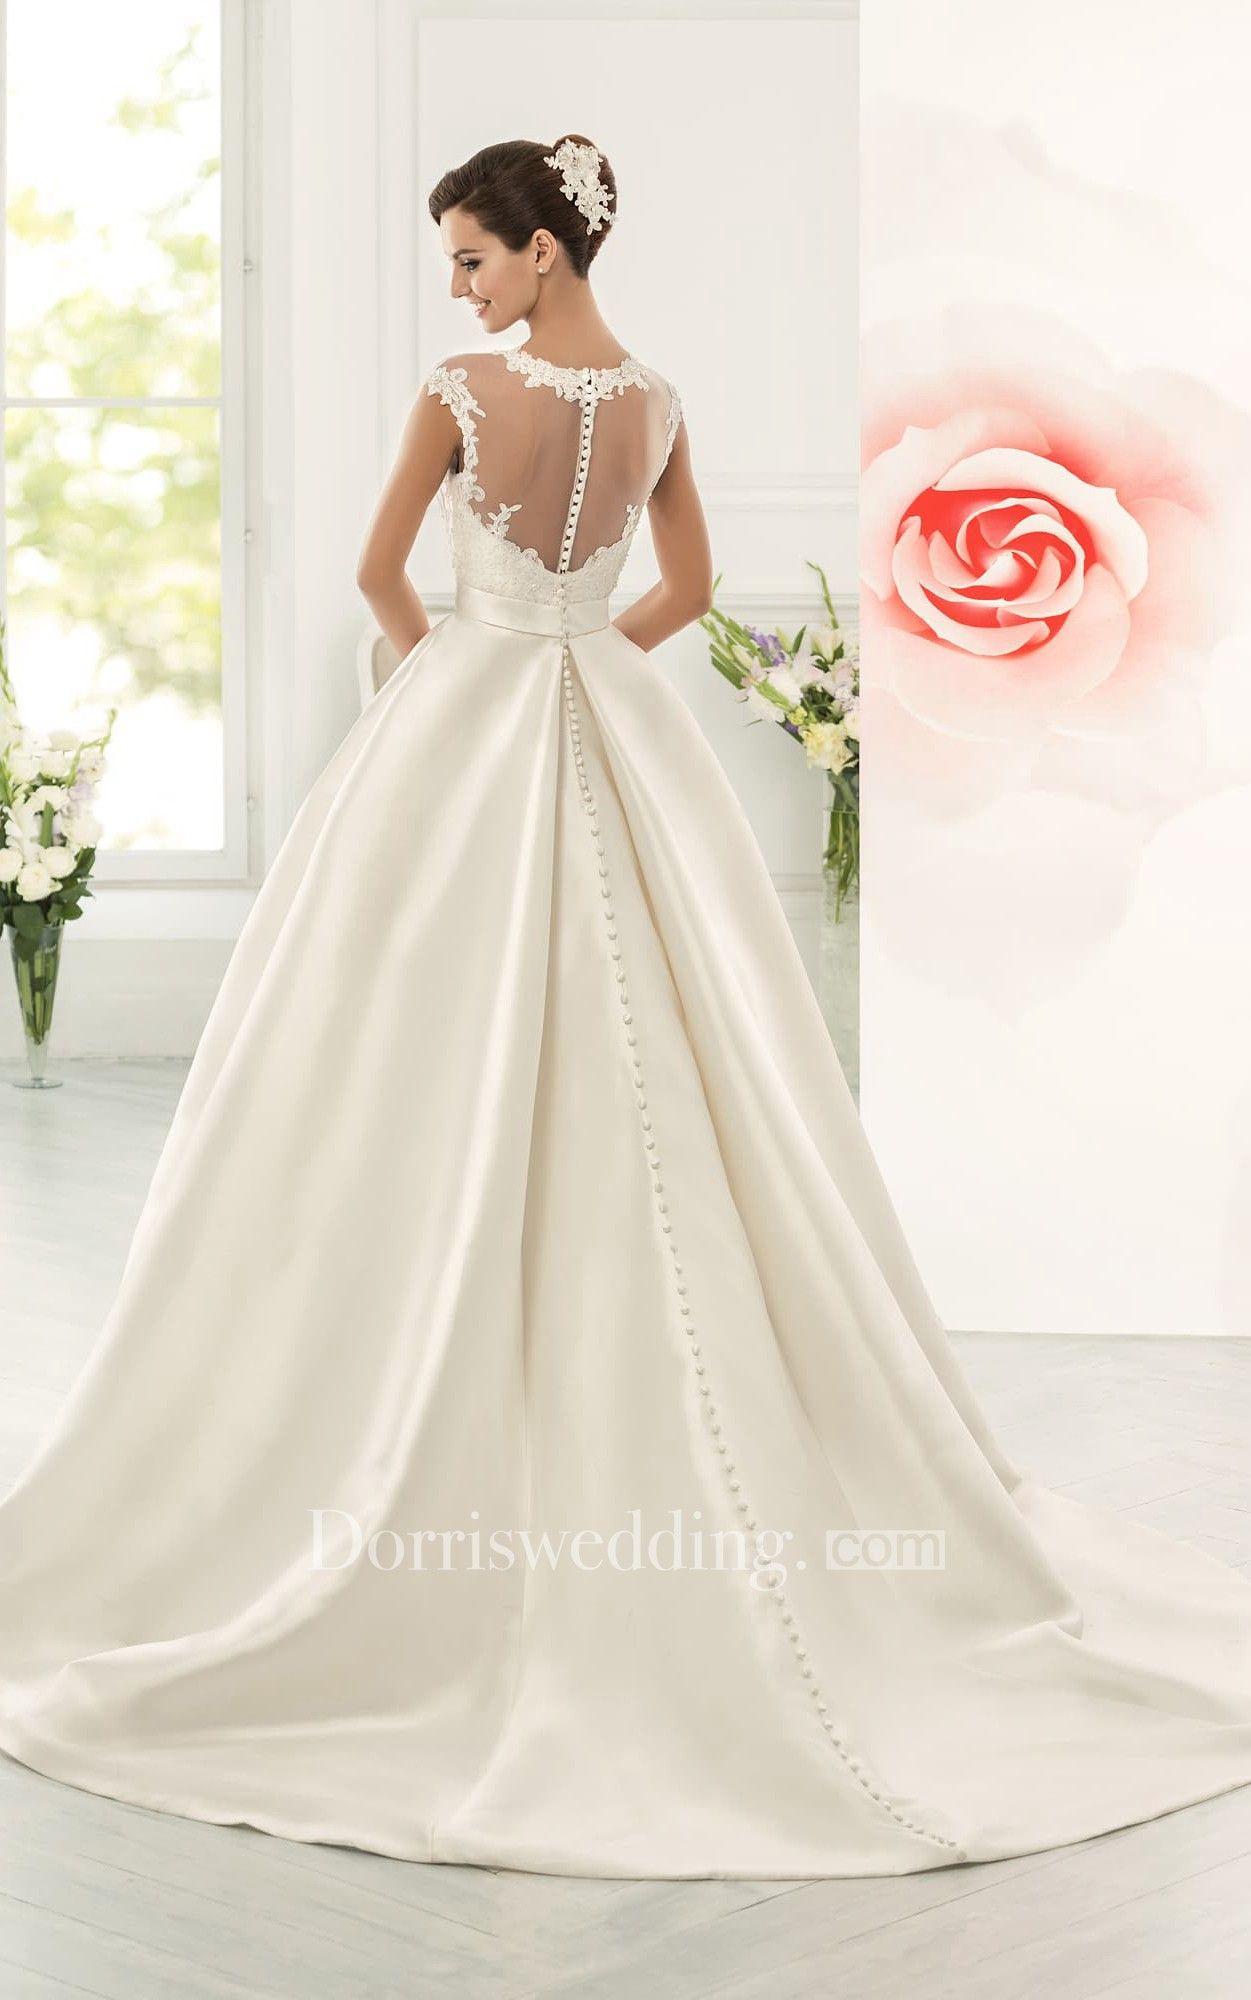 39eaa77ca Jeweled Neck Cap Sleeve A-line Satin Wedding Dress With Lace Bodice -  Dorris Wedding